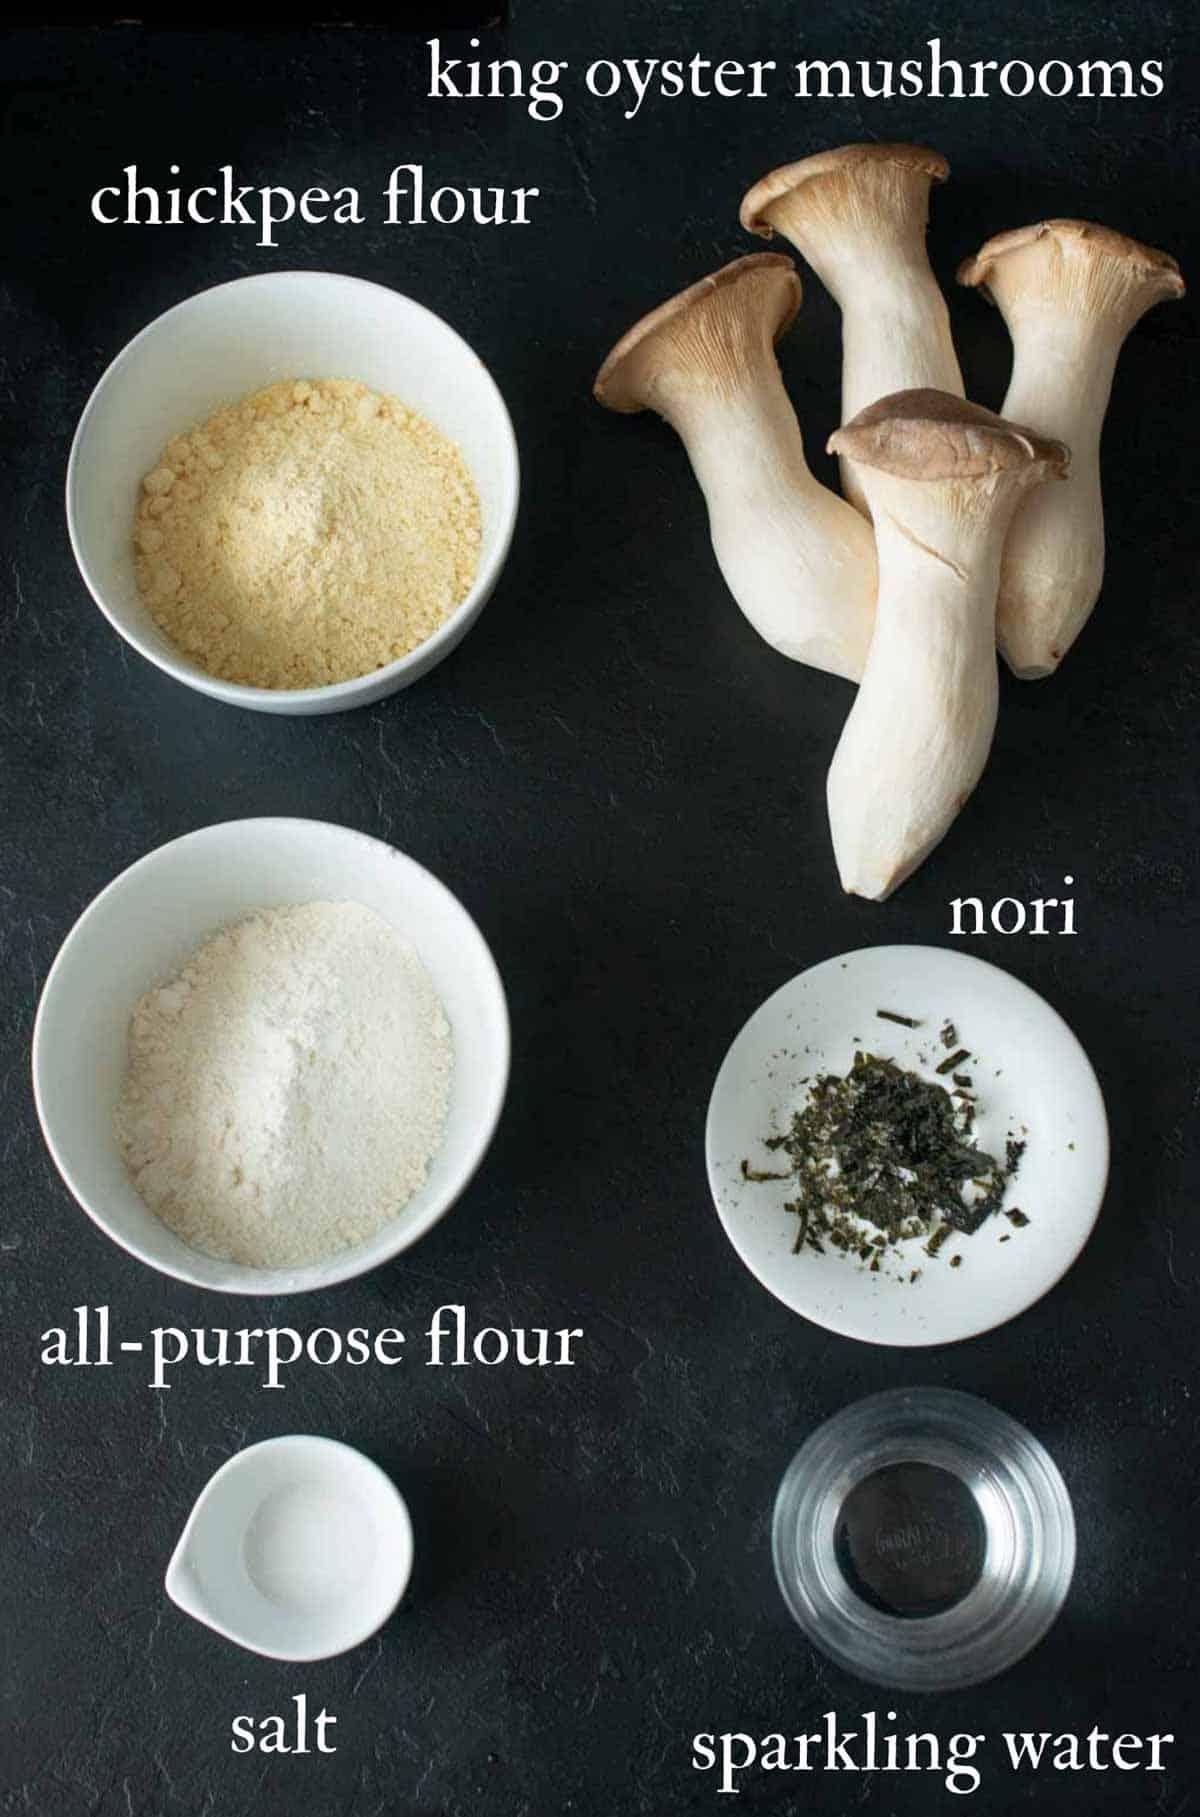 Image: Ingredients